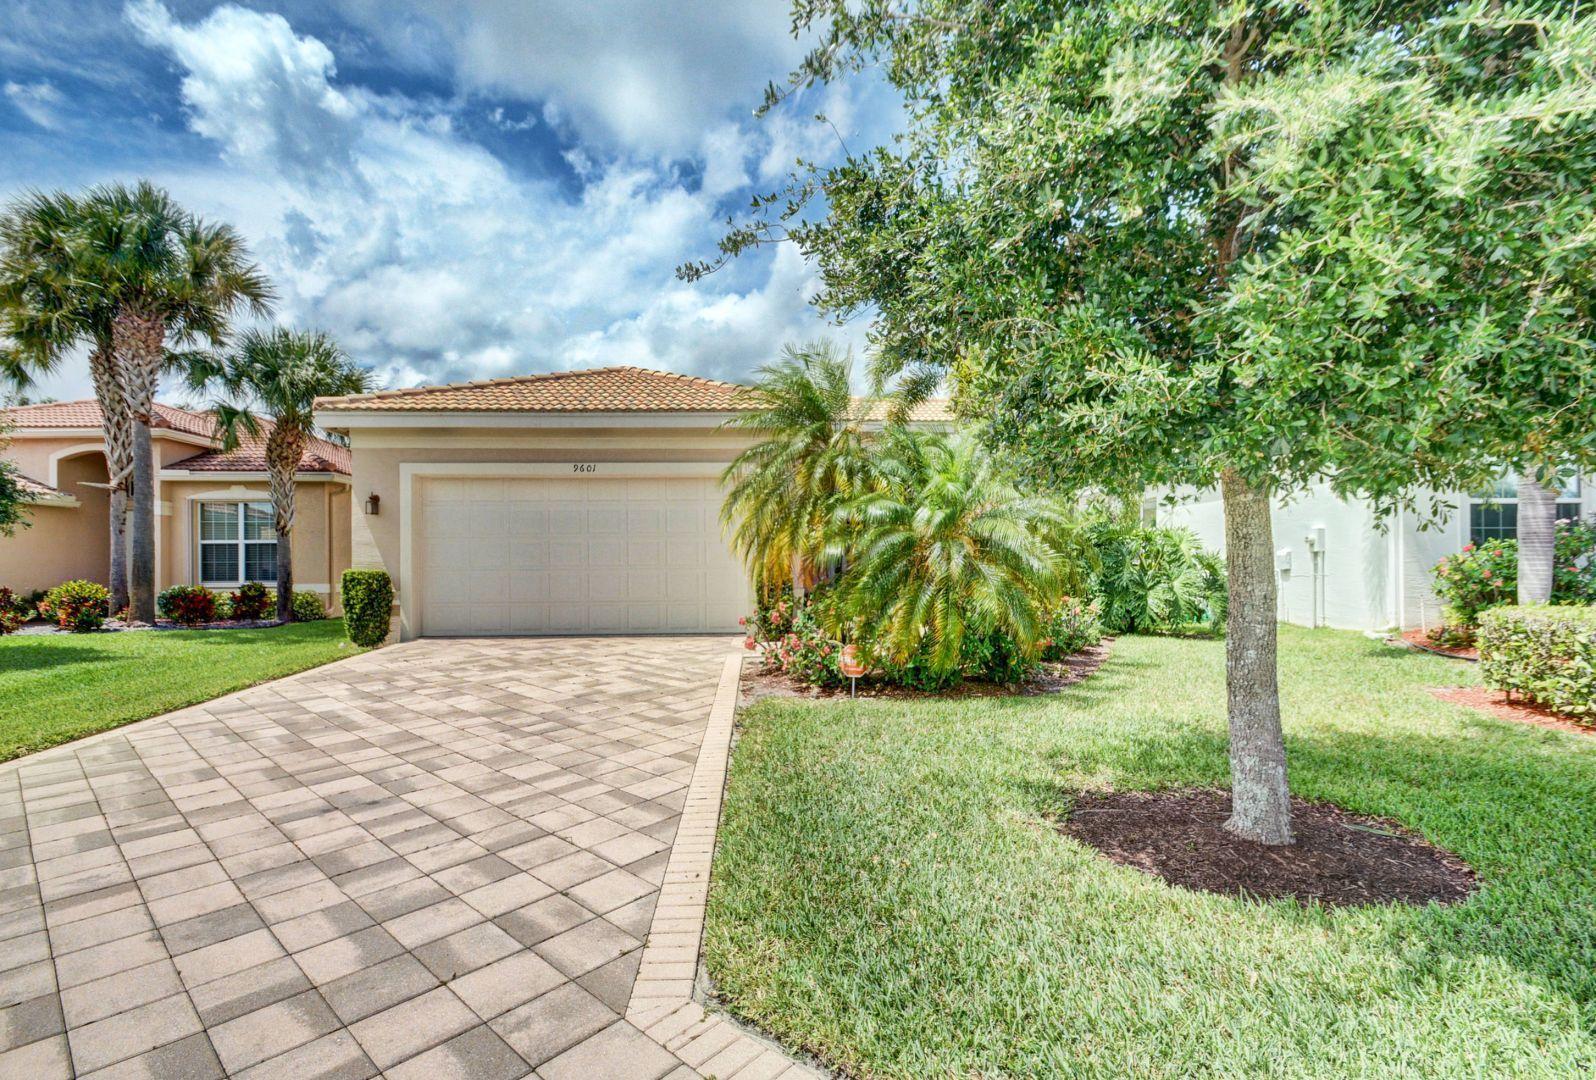 9601 Edengrove Court  Boynton Beach, FL 33473